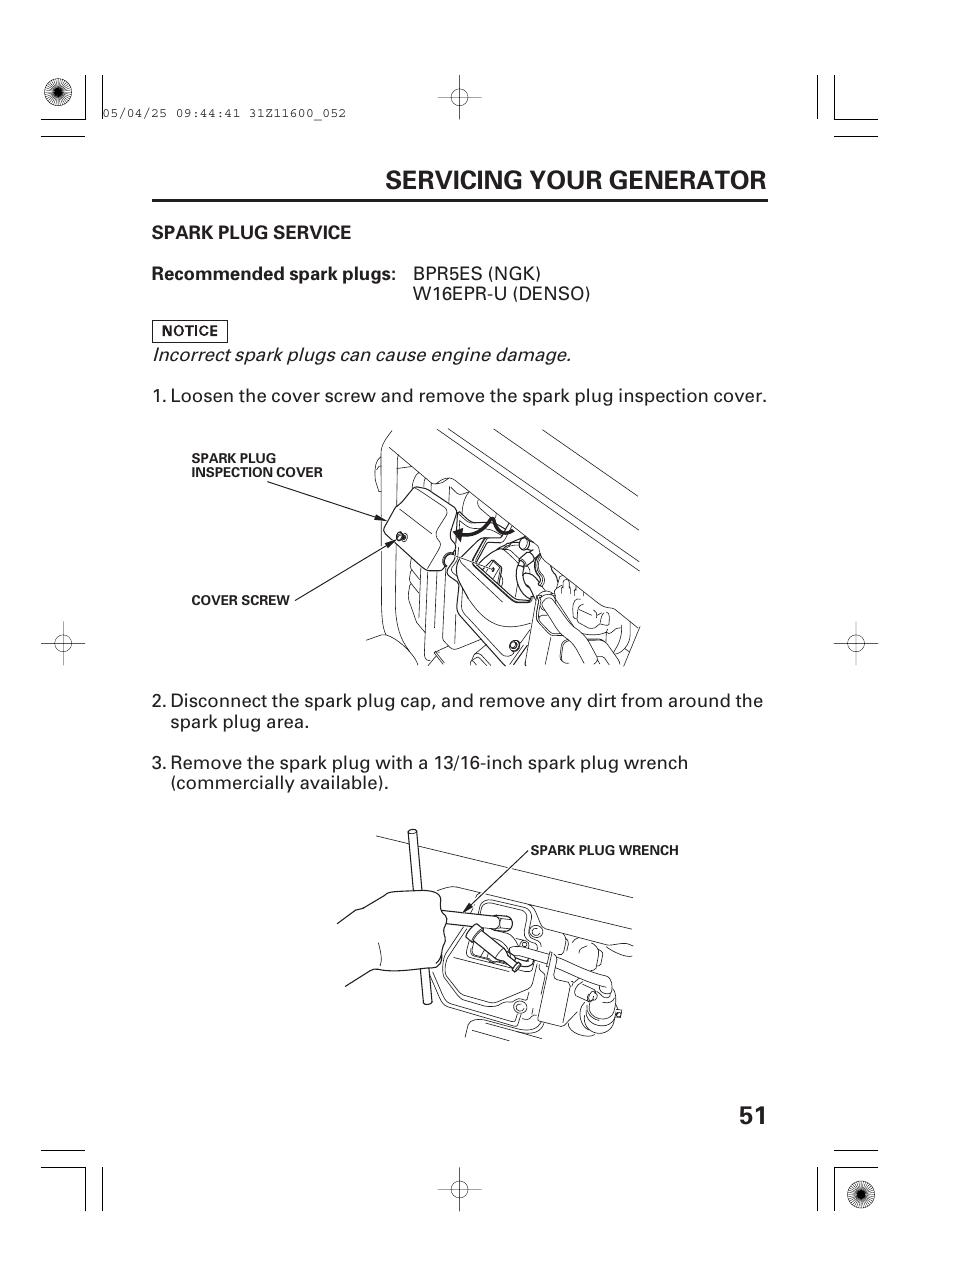 Spark plug service, 51 servicing your generator   HONDA